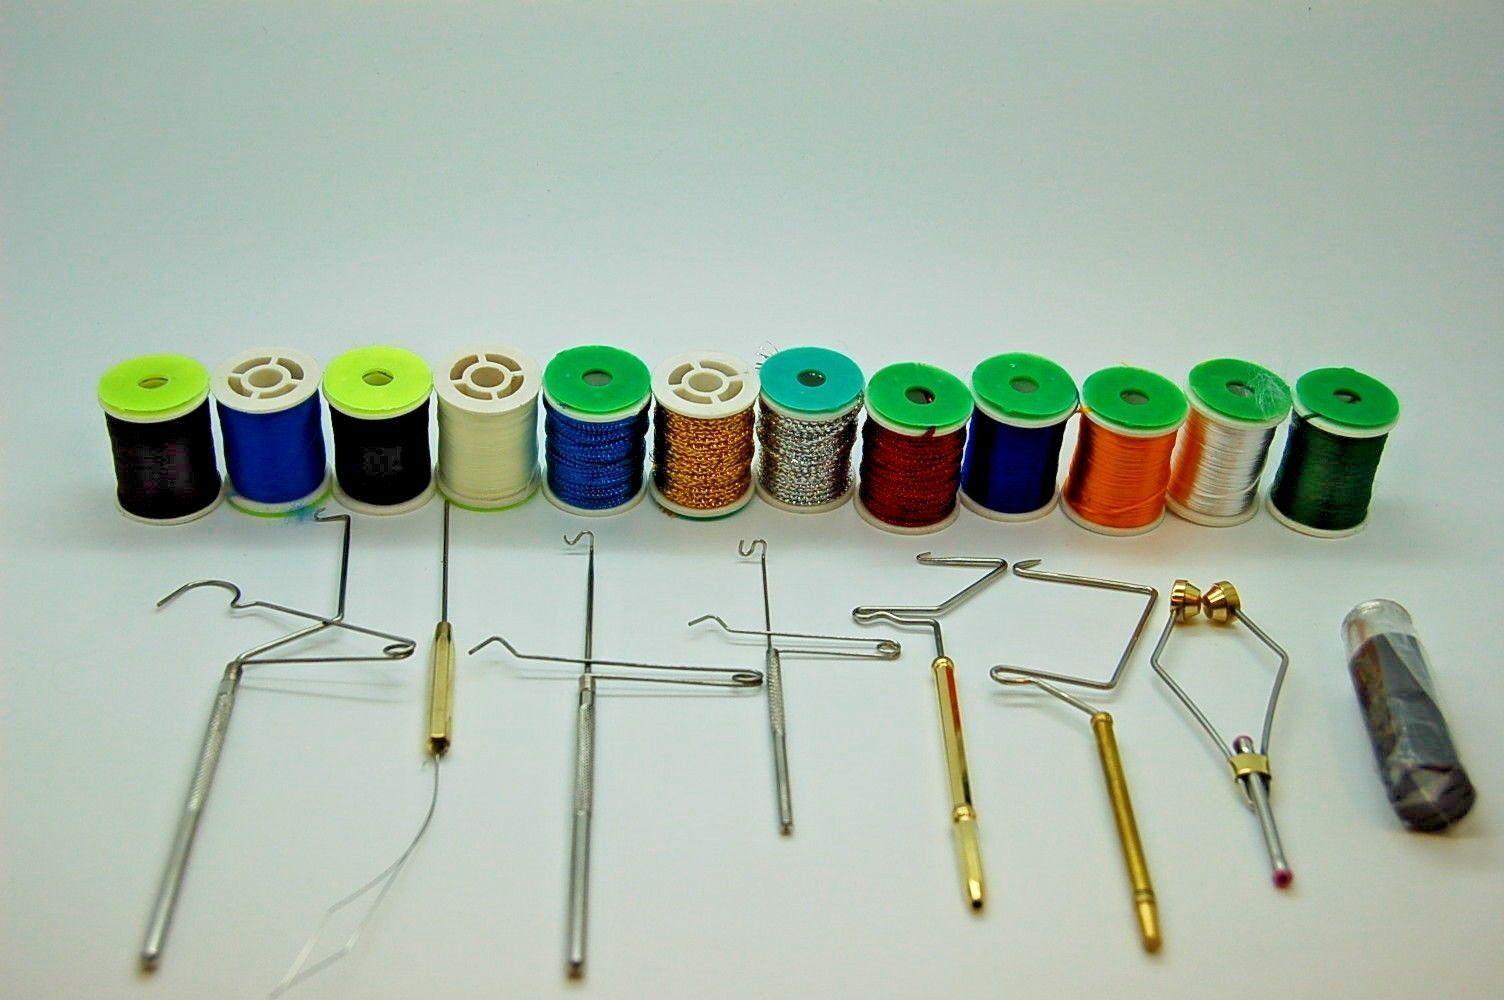 Fly Tying strumento e Material Kit, Floss, Tinsel, Thread, Whip Finisher, Bodkin